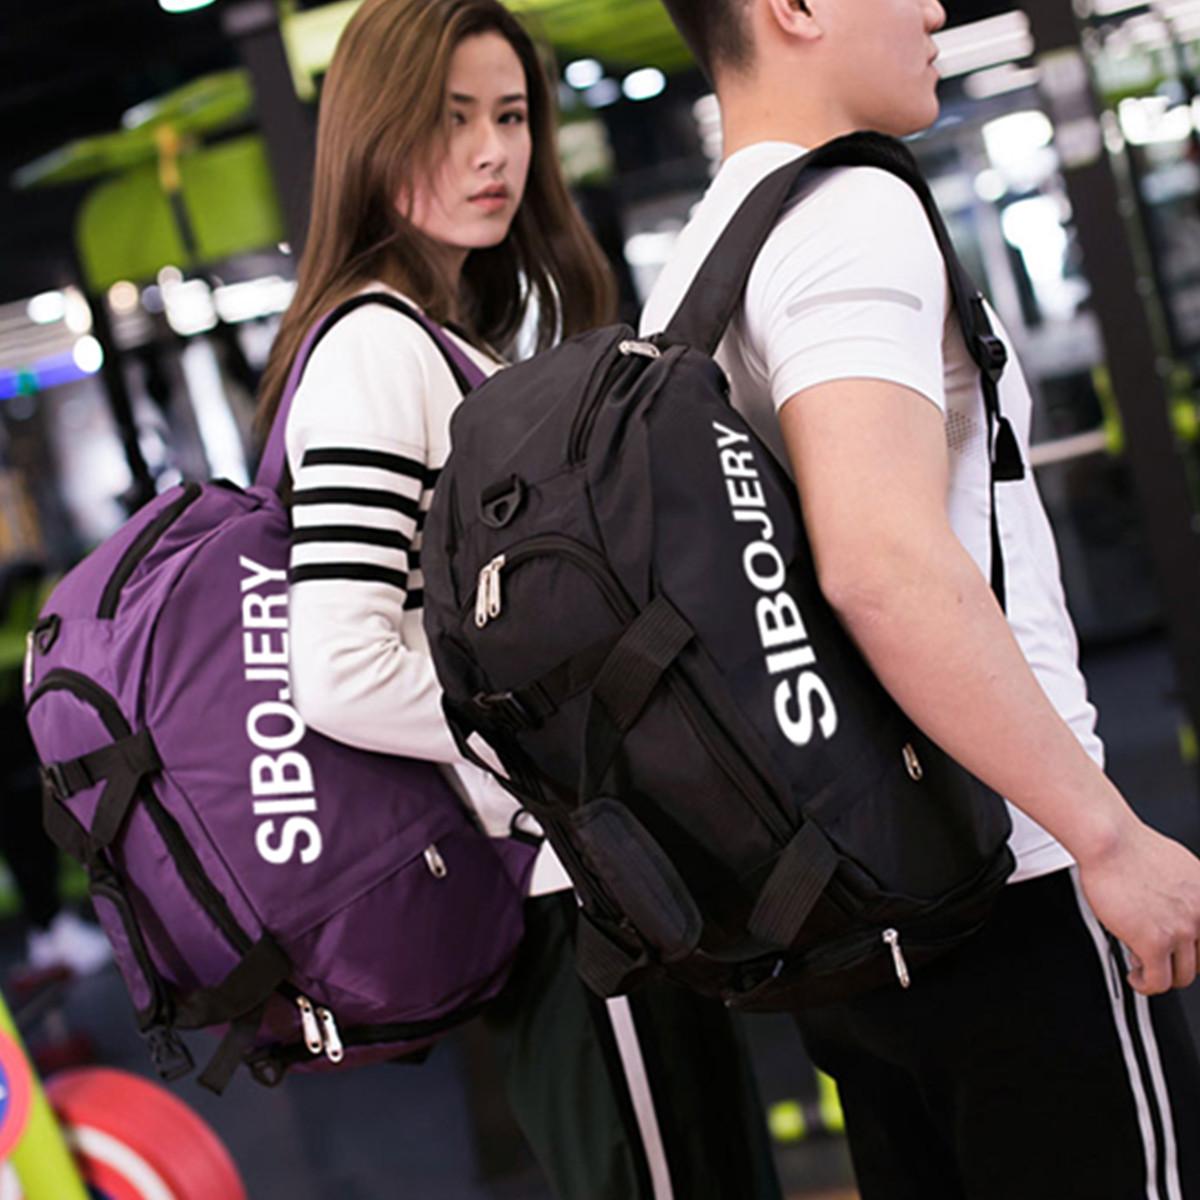 Sports Gym Backpack Wet Dry Separation Waterproof Yoga Handbag Leisure Fitness Travel Duffel Bag